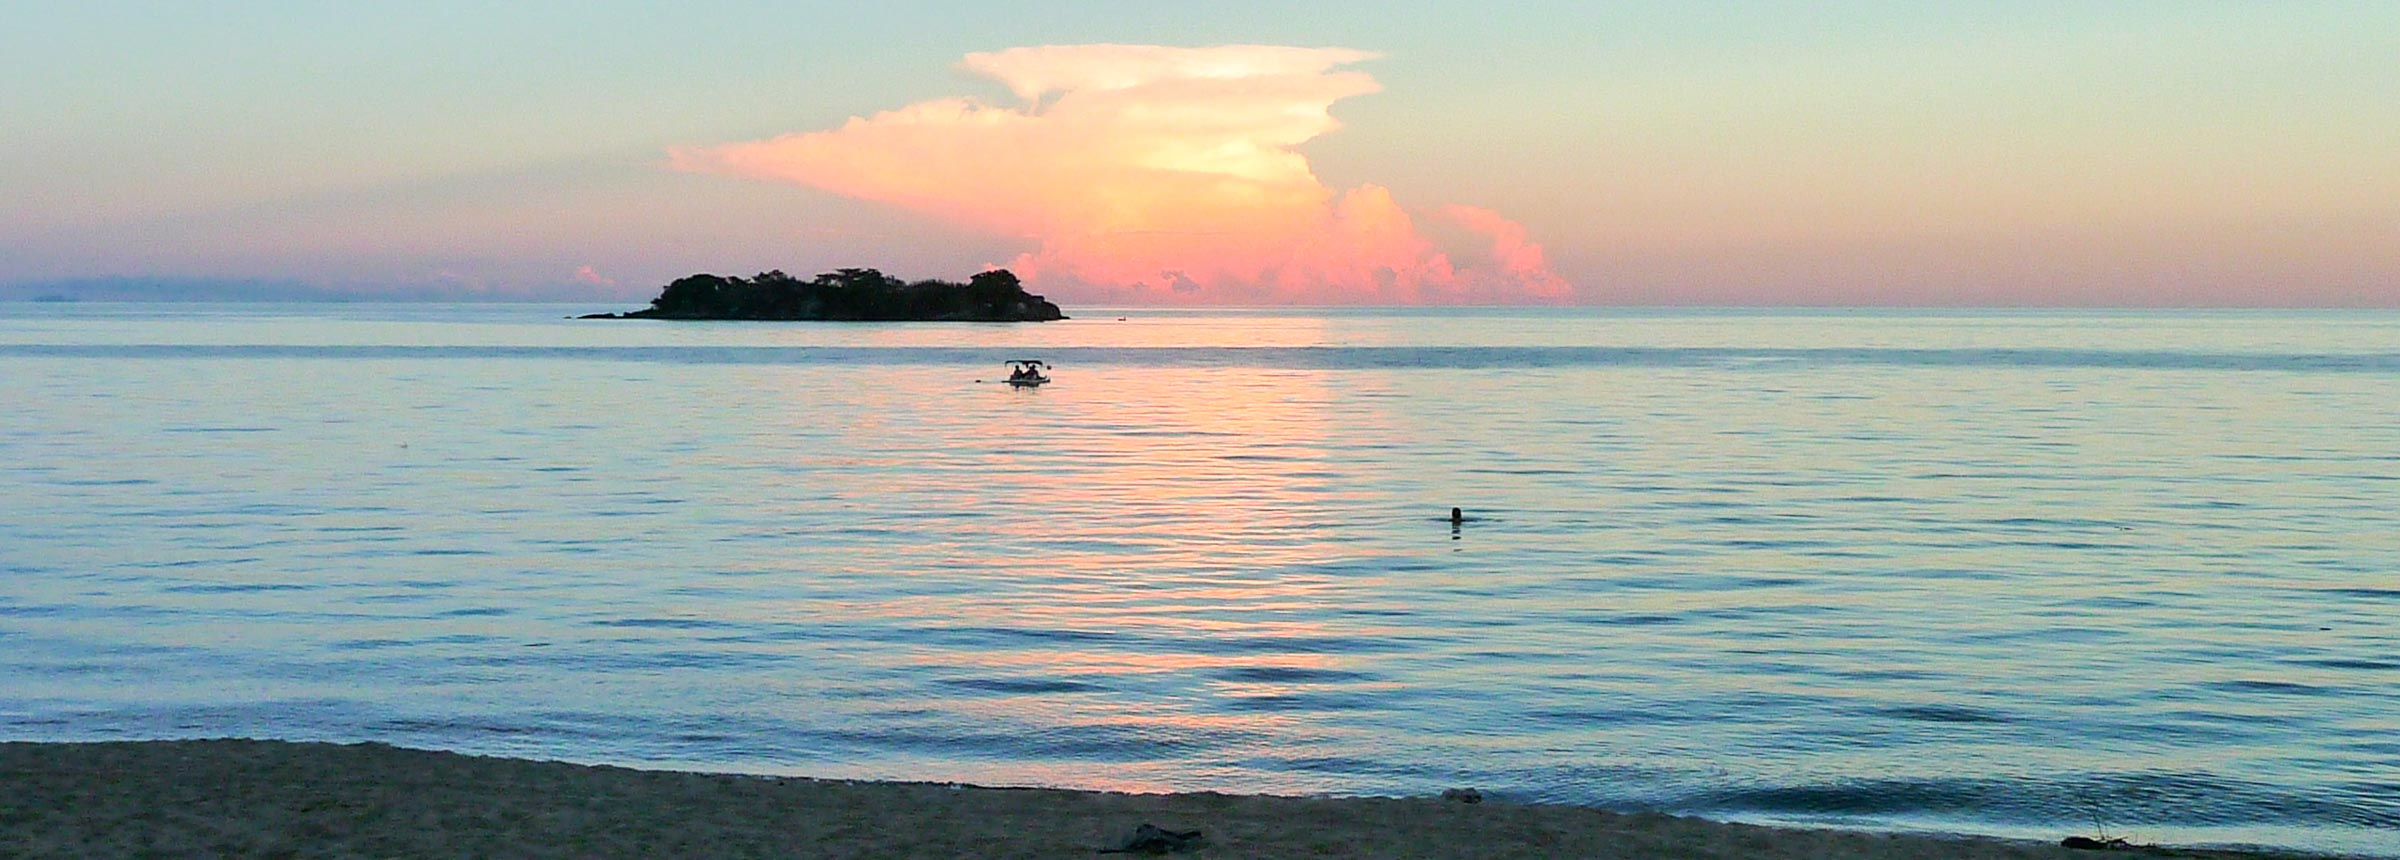 Malawi lake Victoria sunset